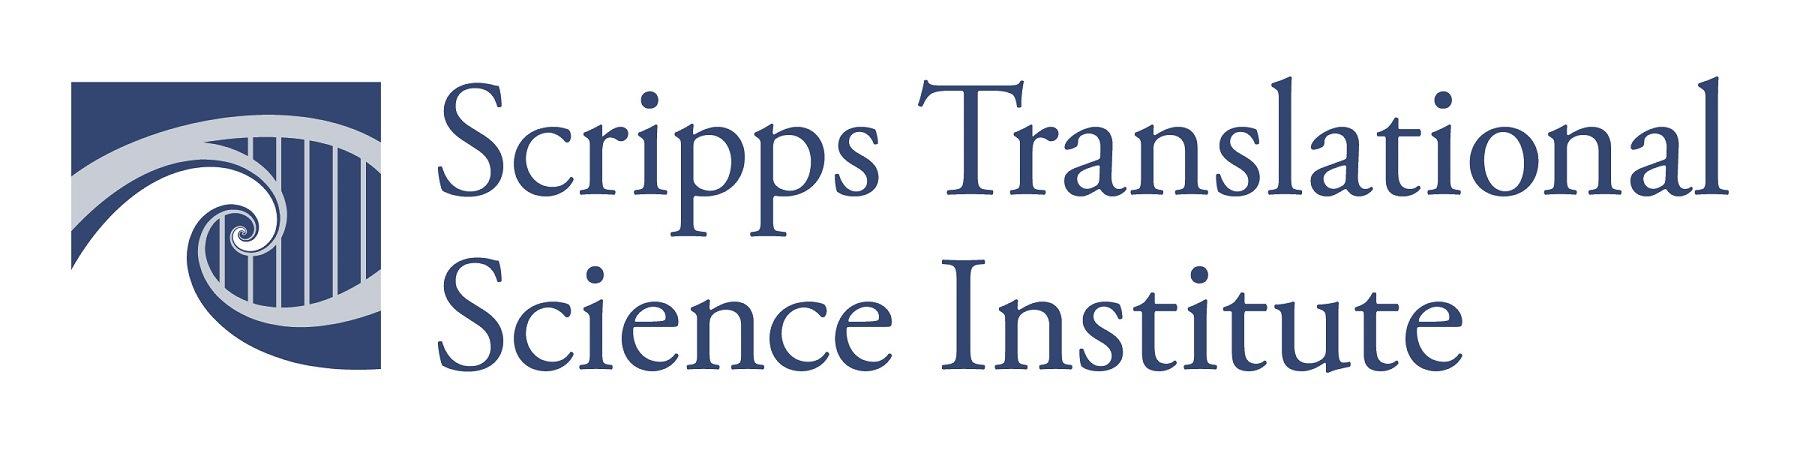 Scripps Translational Science Institute Logo